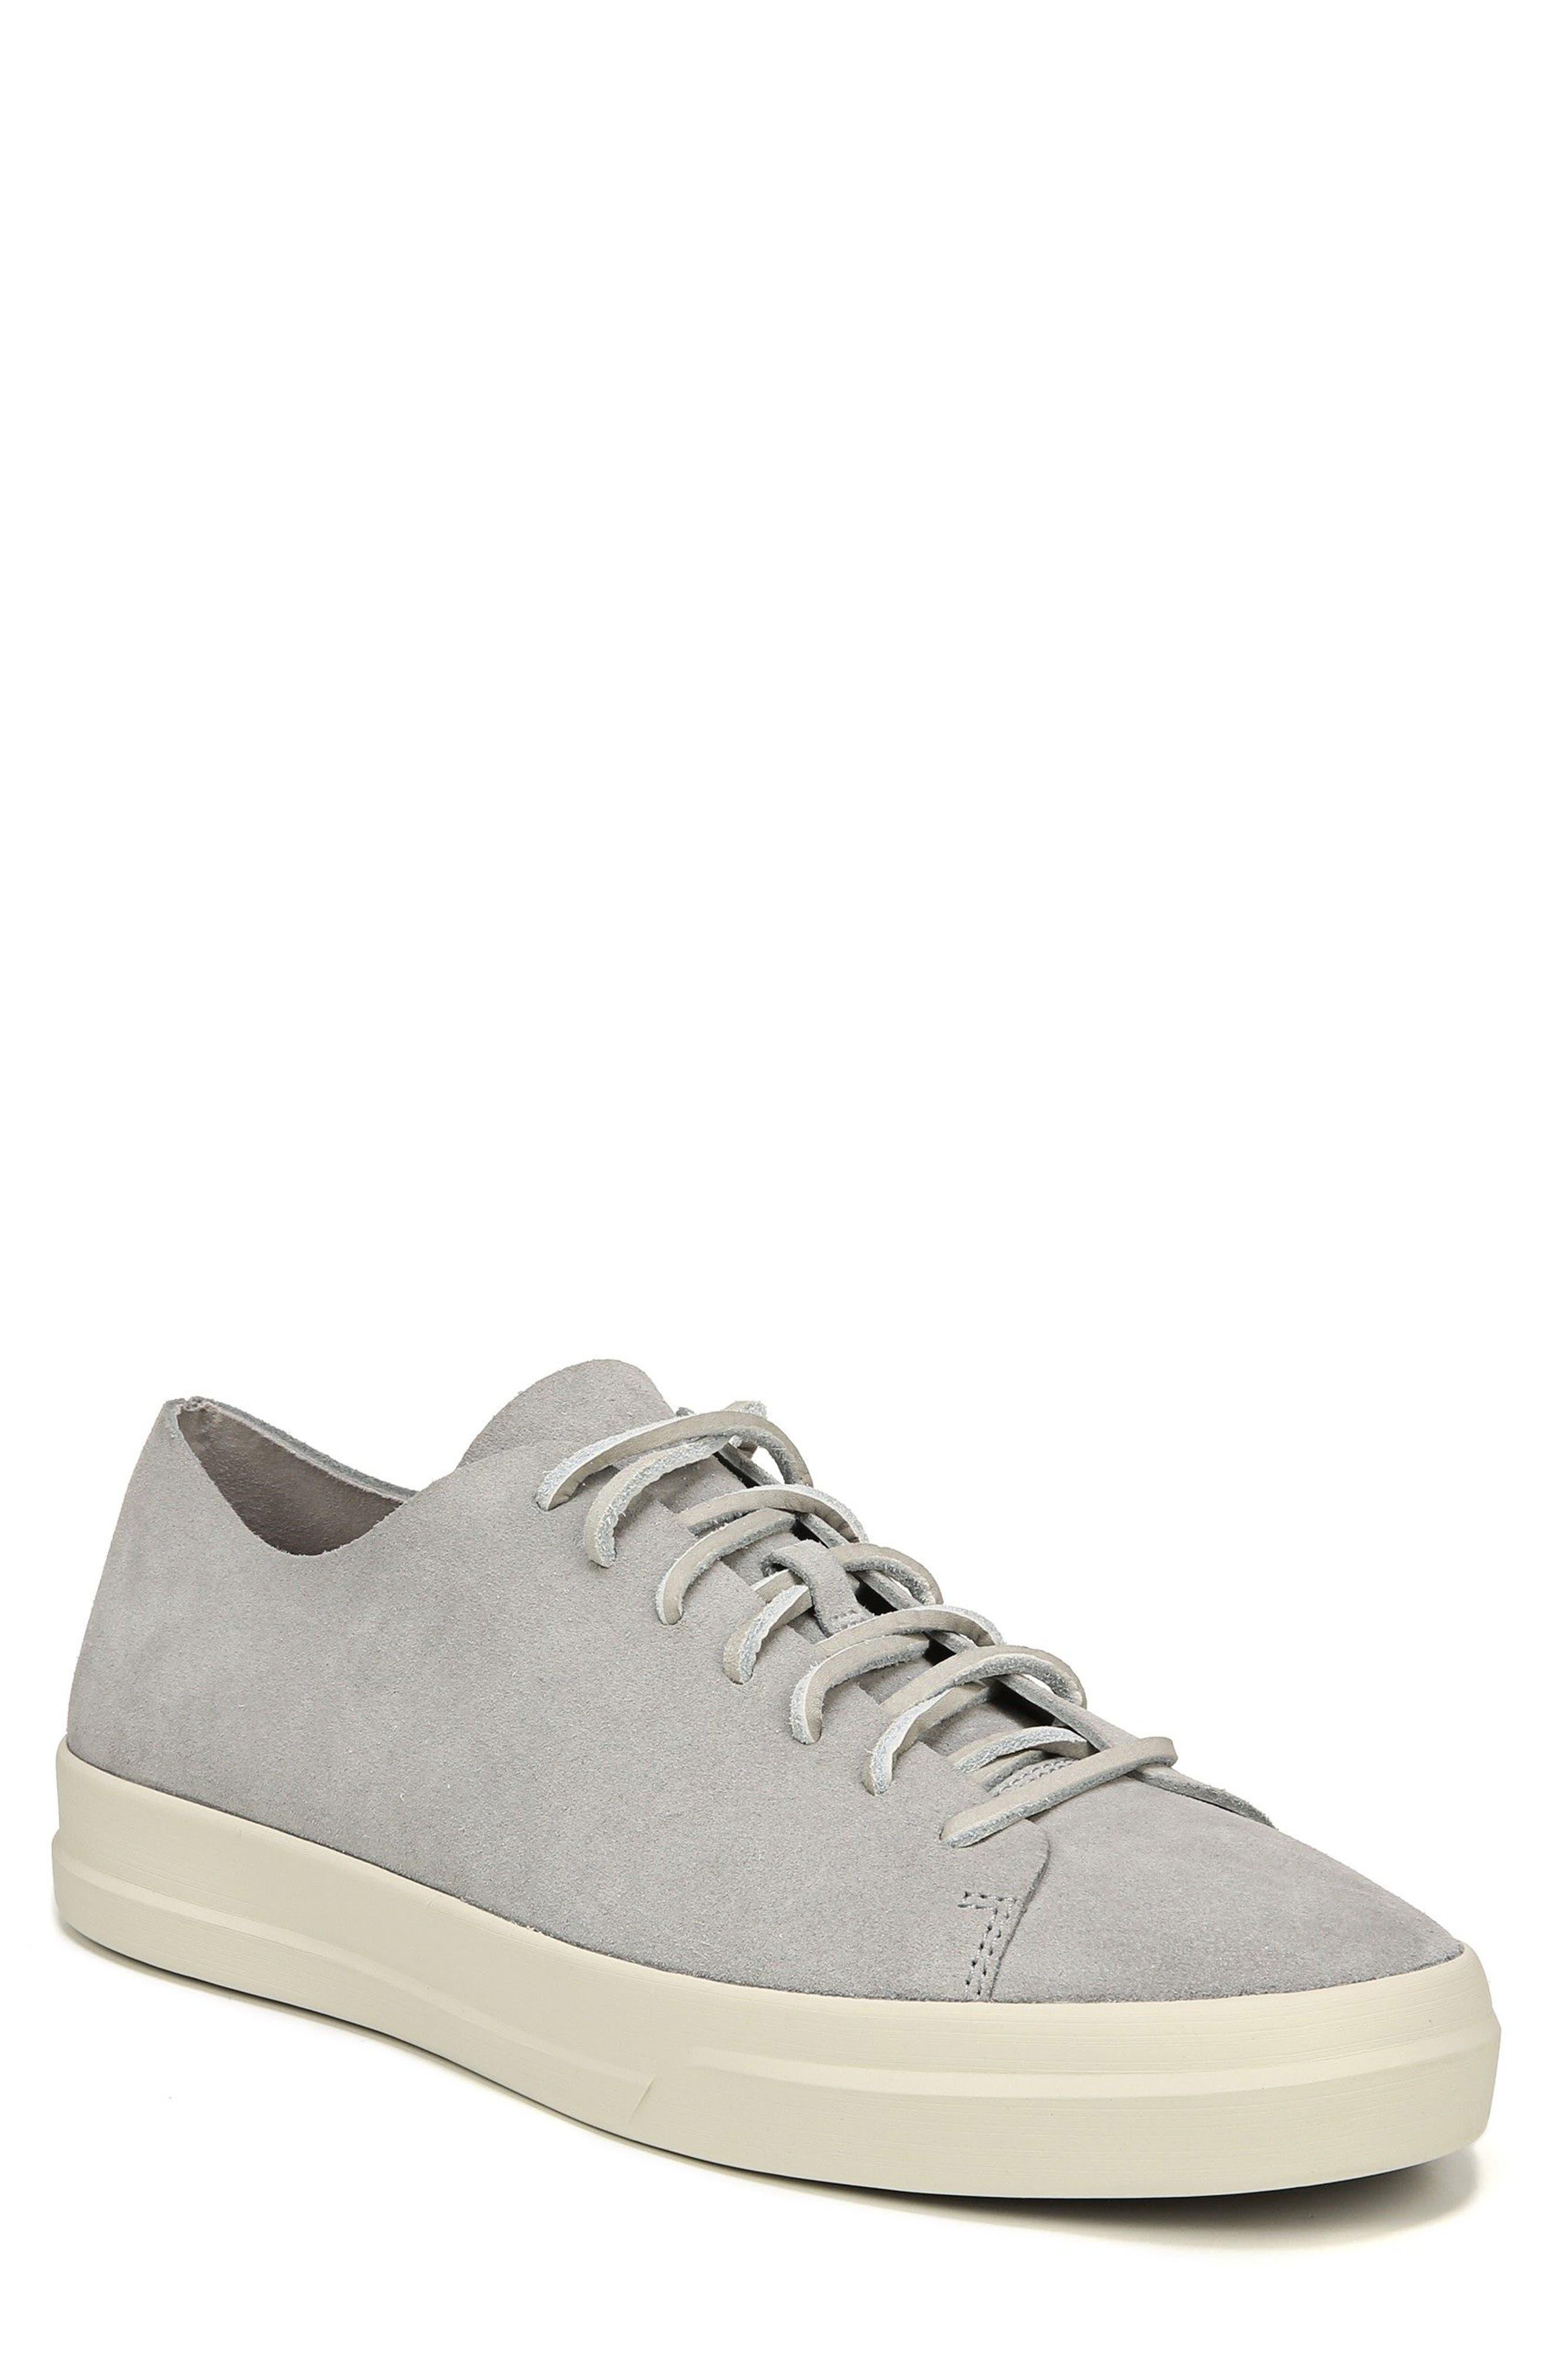 Copeland Sneaker, Main, color, 022